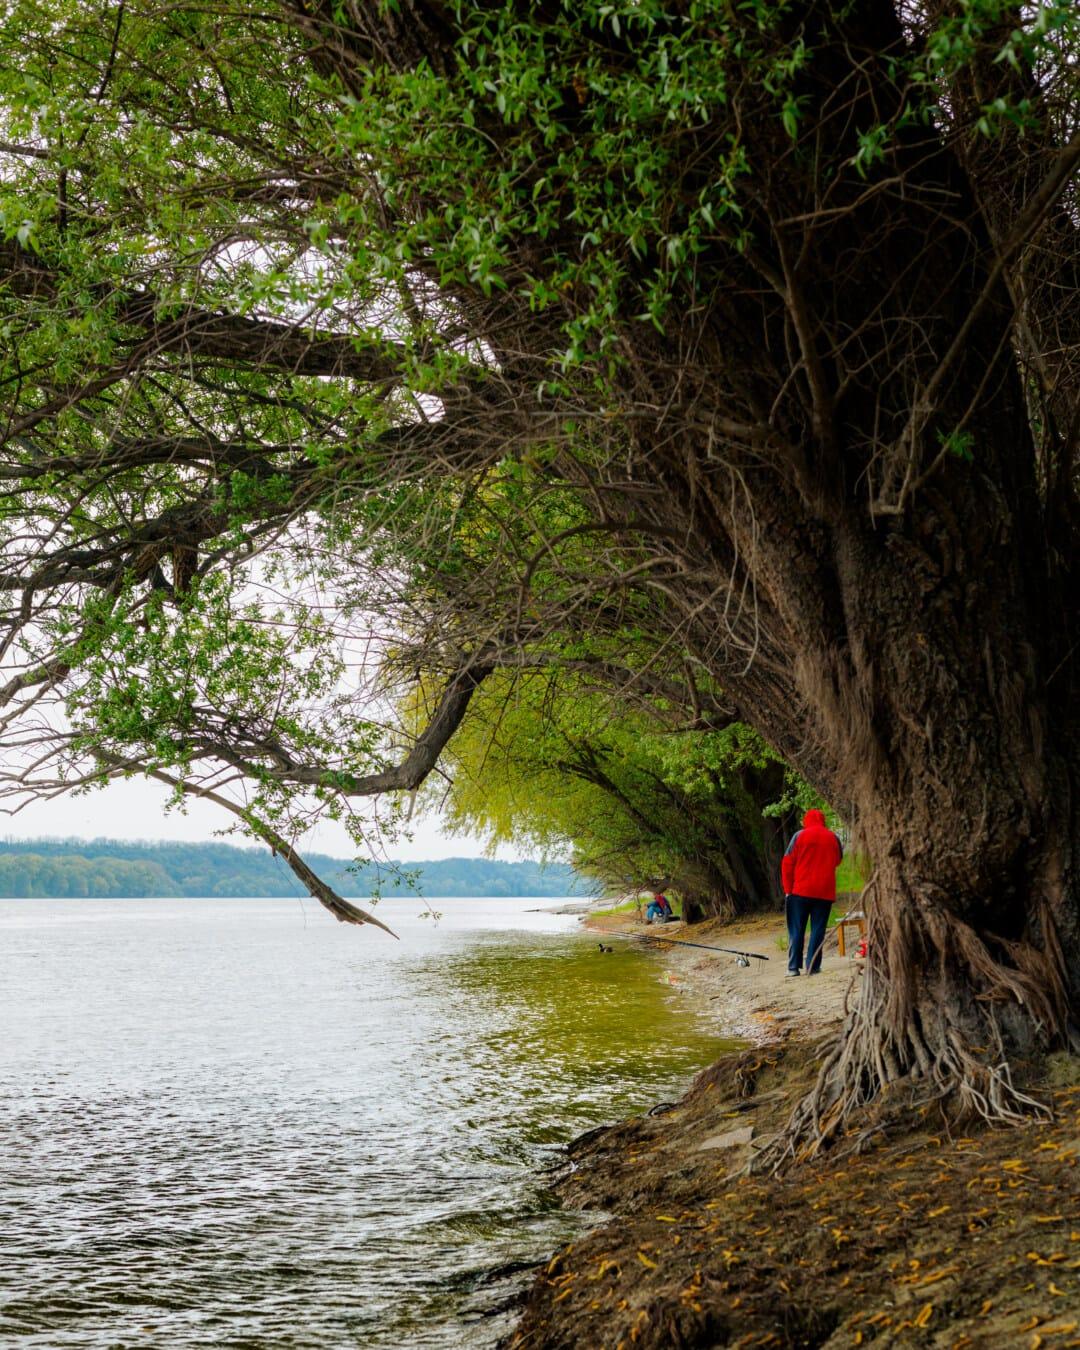 fisherman, fishing rod, fishing, riverbank, cold, wilderness, water, lake, river, landscape